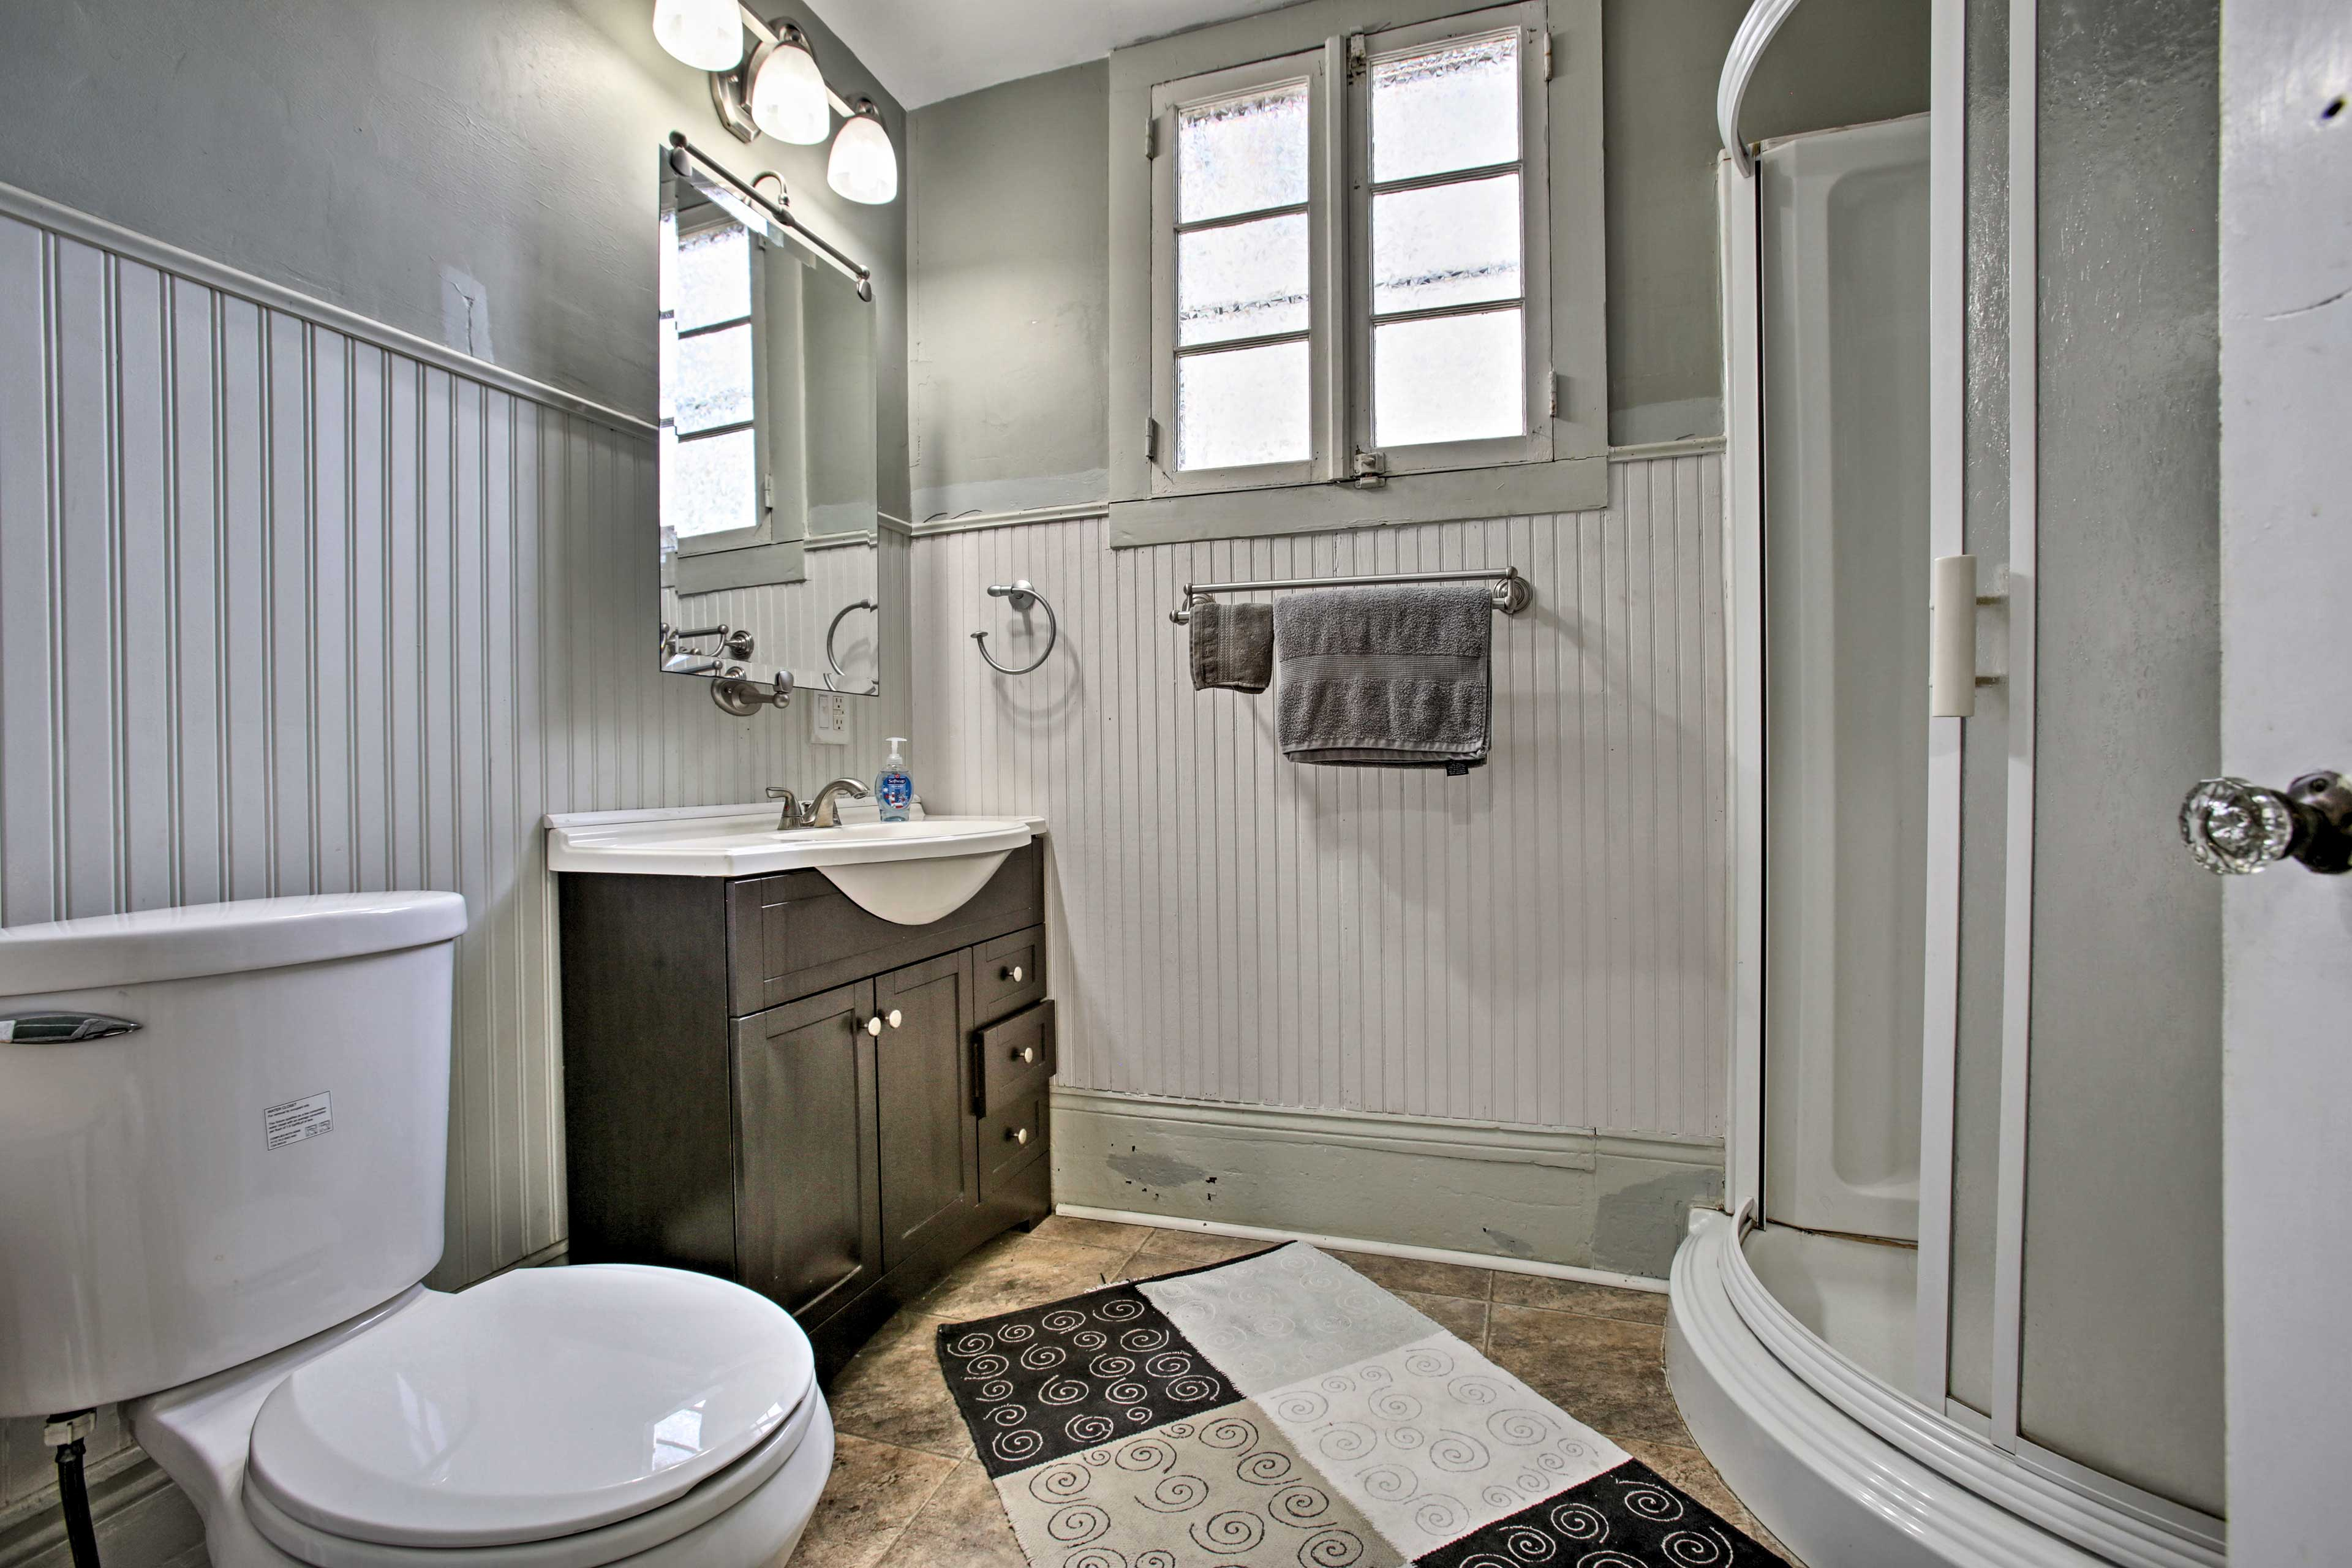 This bathroom boasts a spacious walk-in shower.